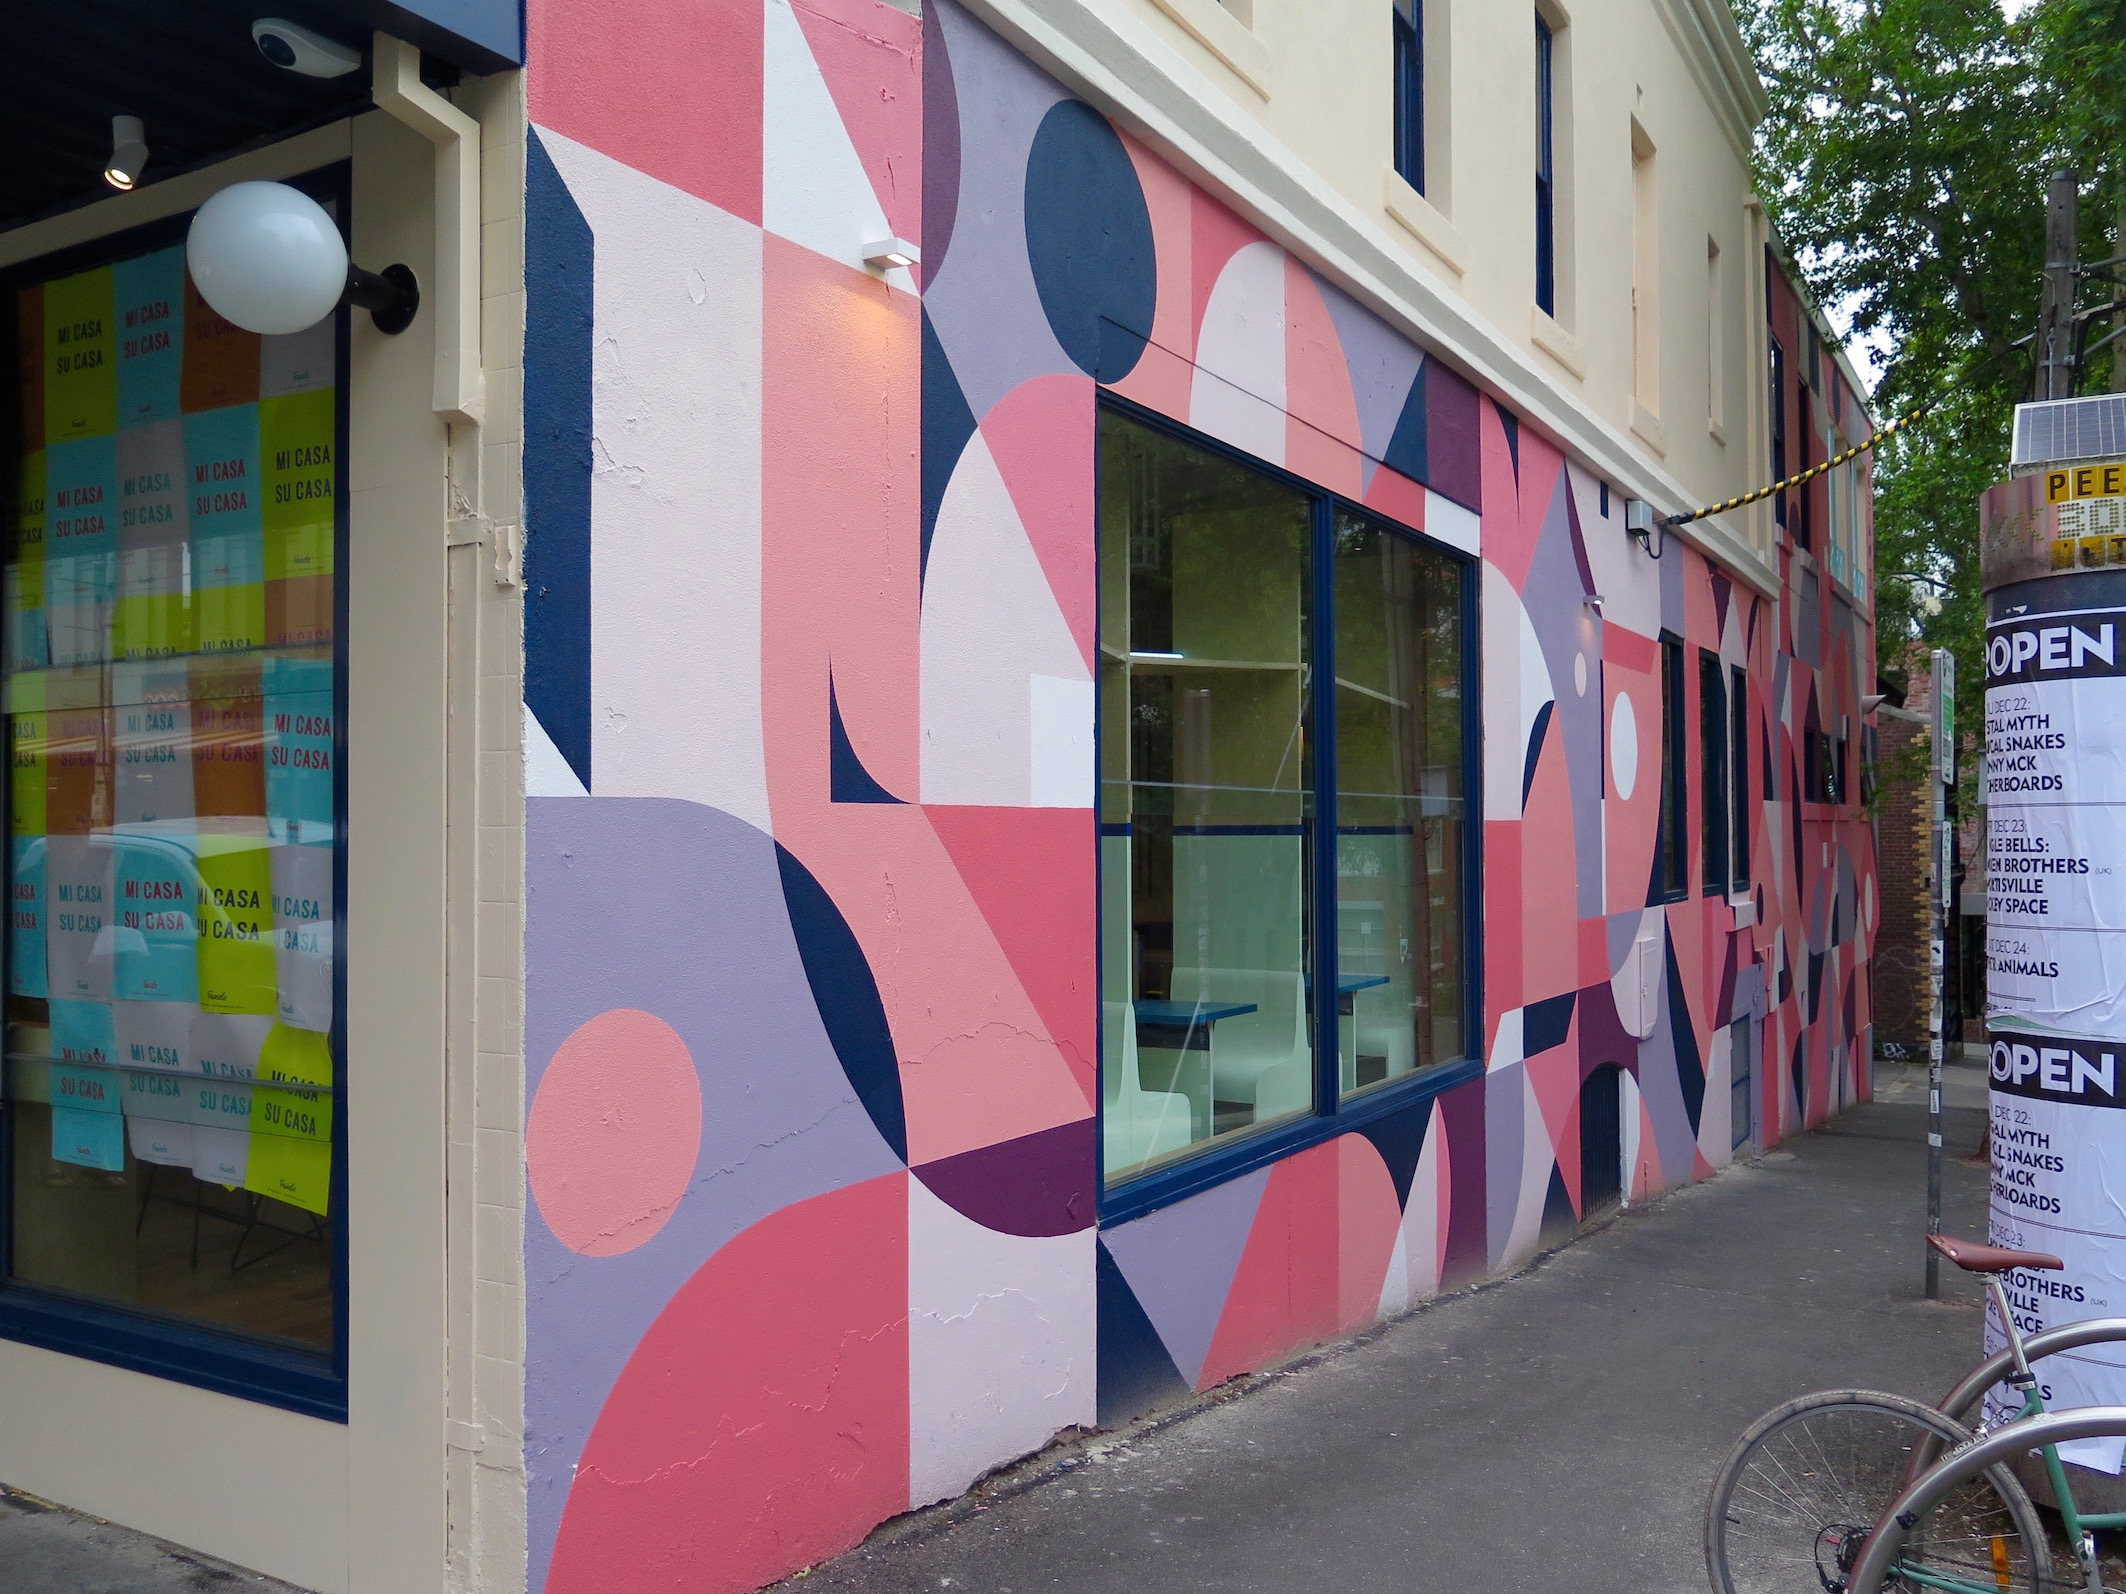 deansunshine_landofsunshine_melbourne_streetart_graffiti_deams-fonda-2